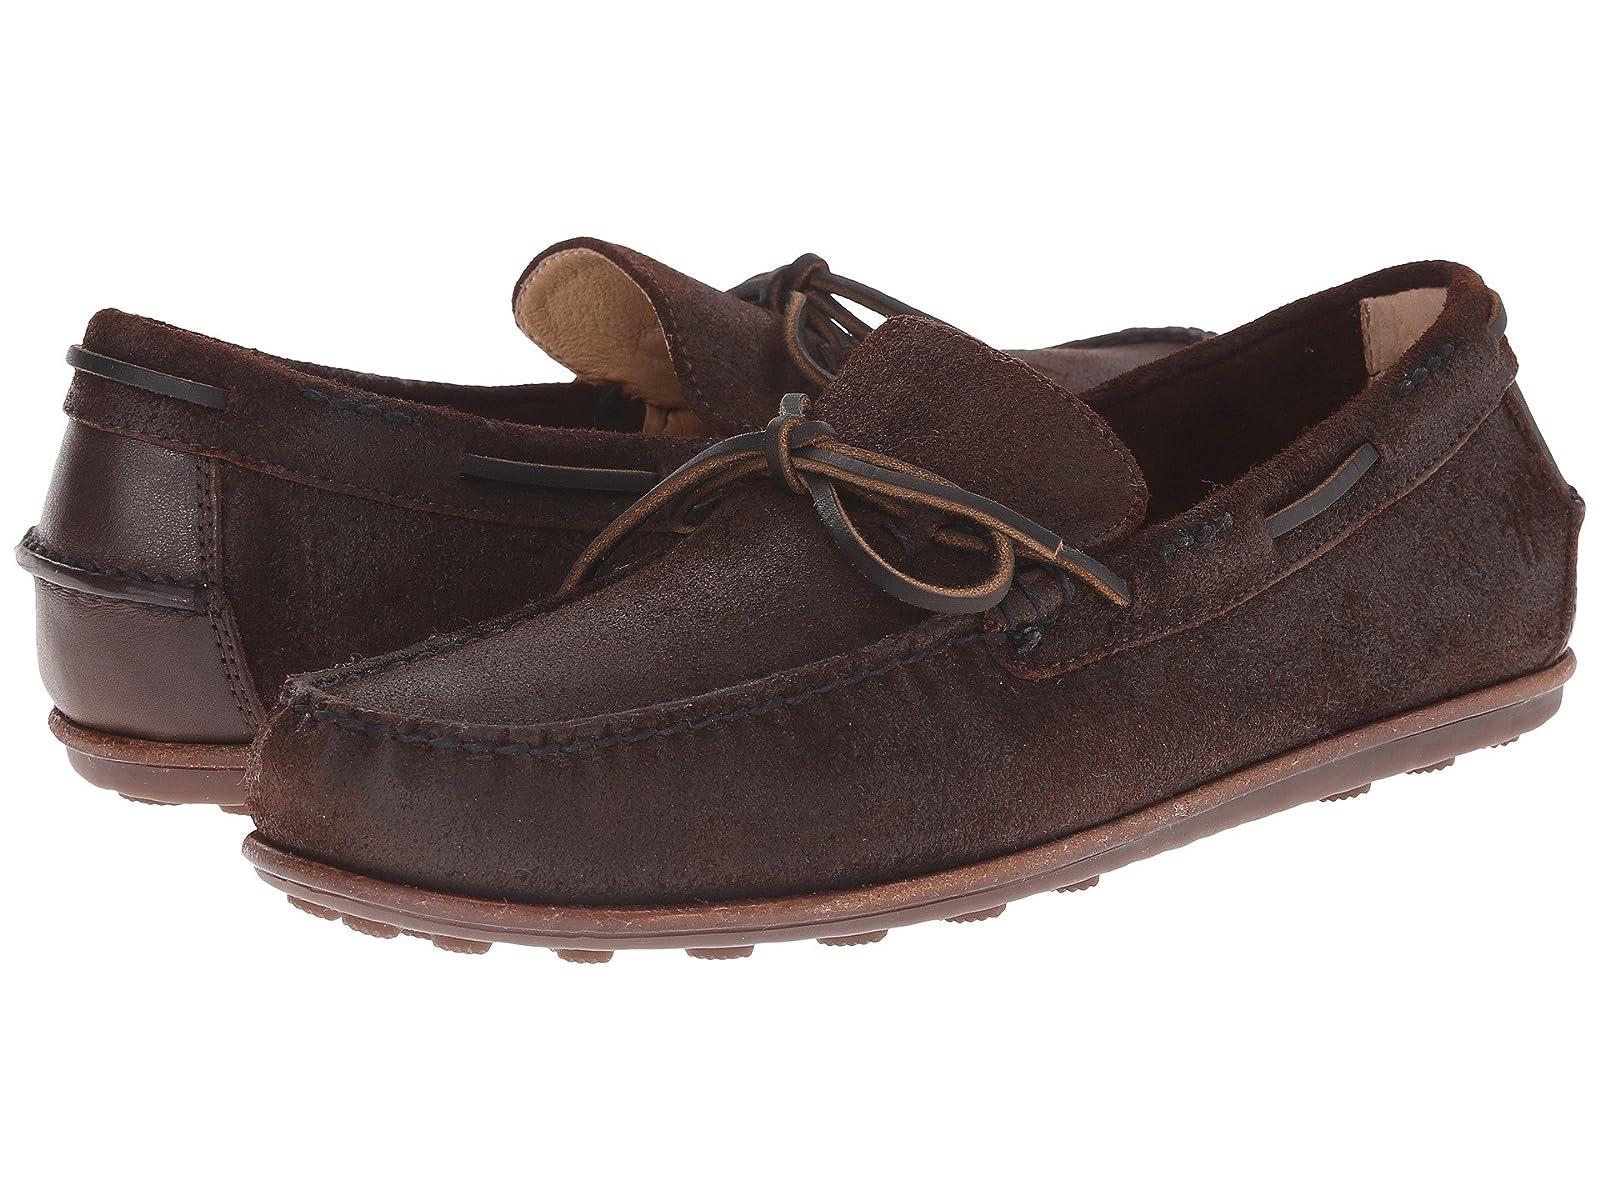 Frye Harris TieCheap and distinctive eye-catching shoes